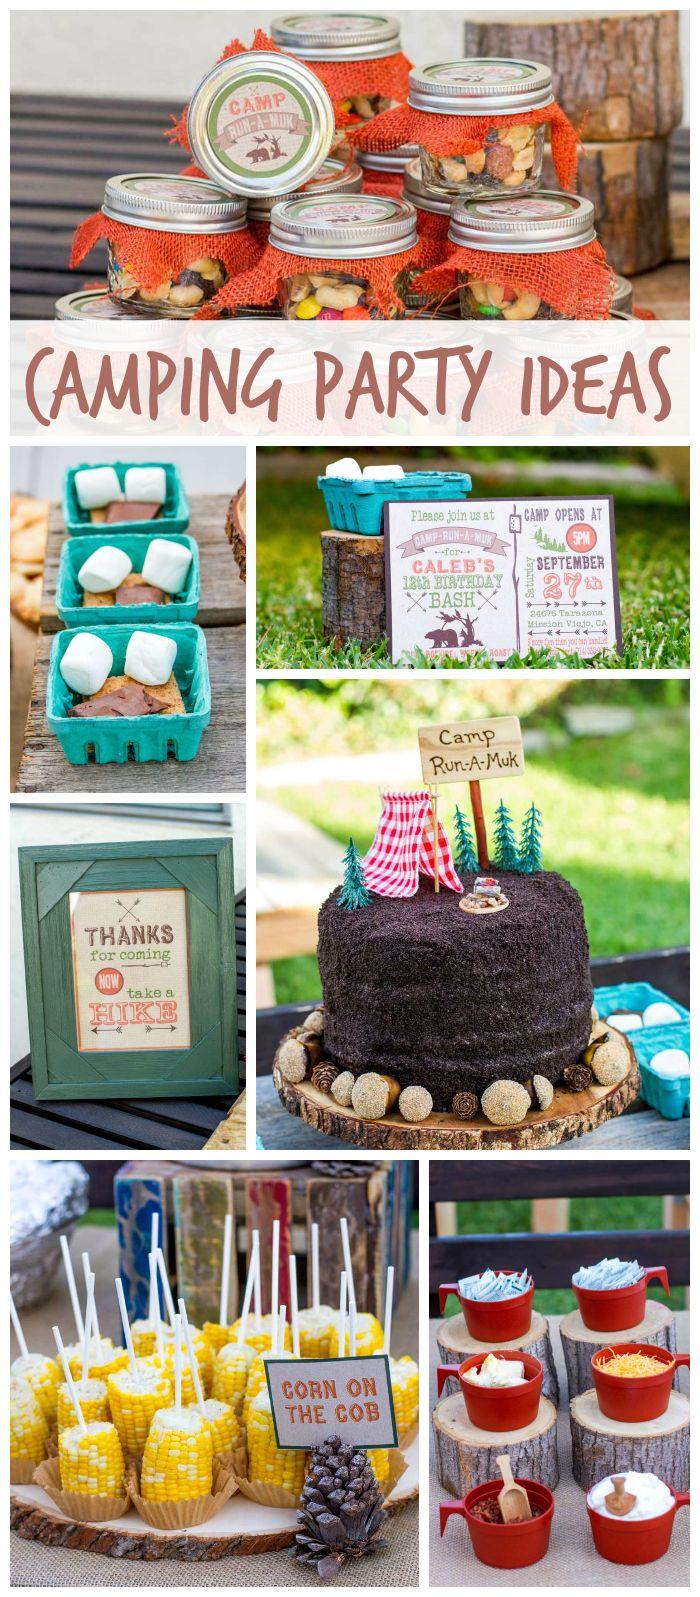 11.backyard camping boy birthday party with fun foods smores mason via SIMPHOME.COM